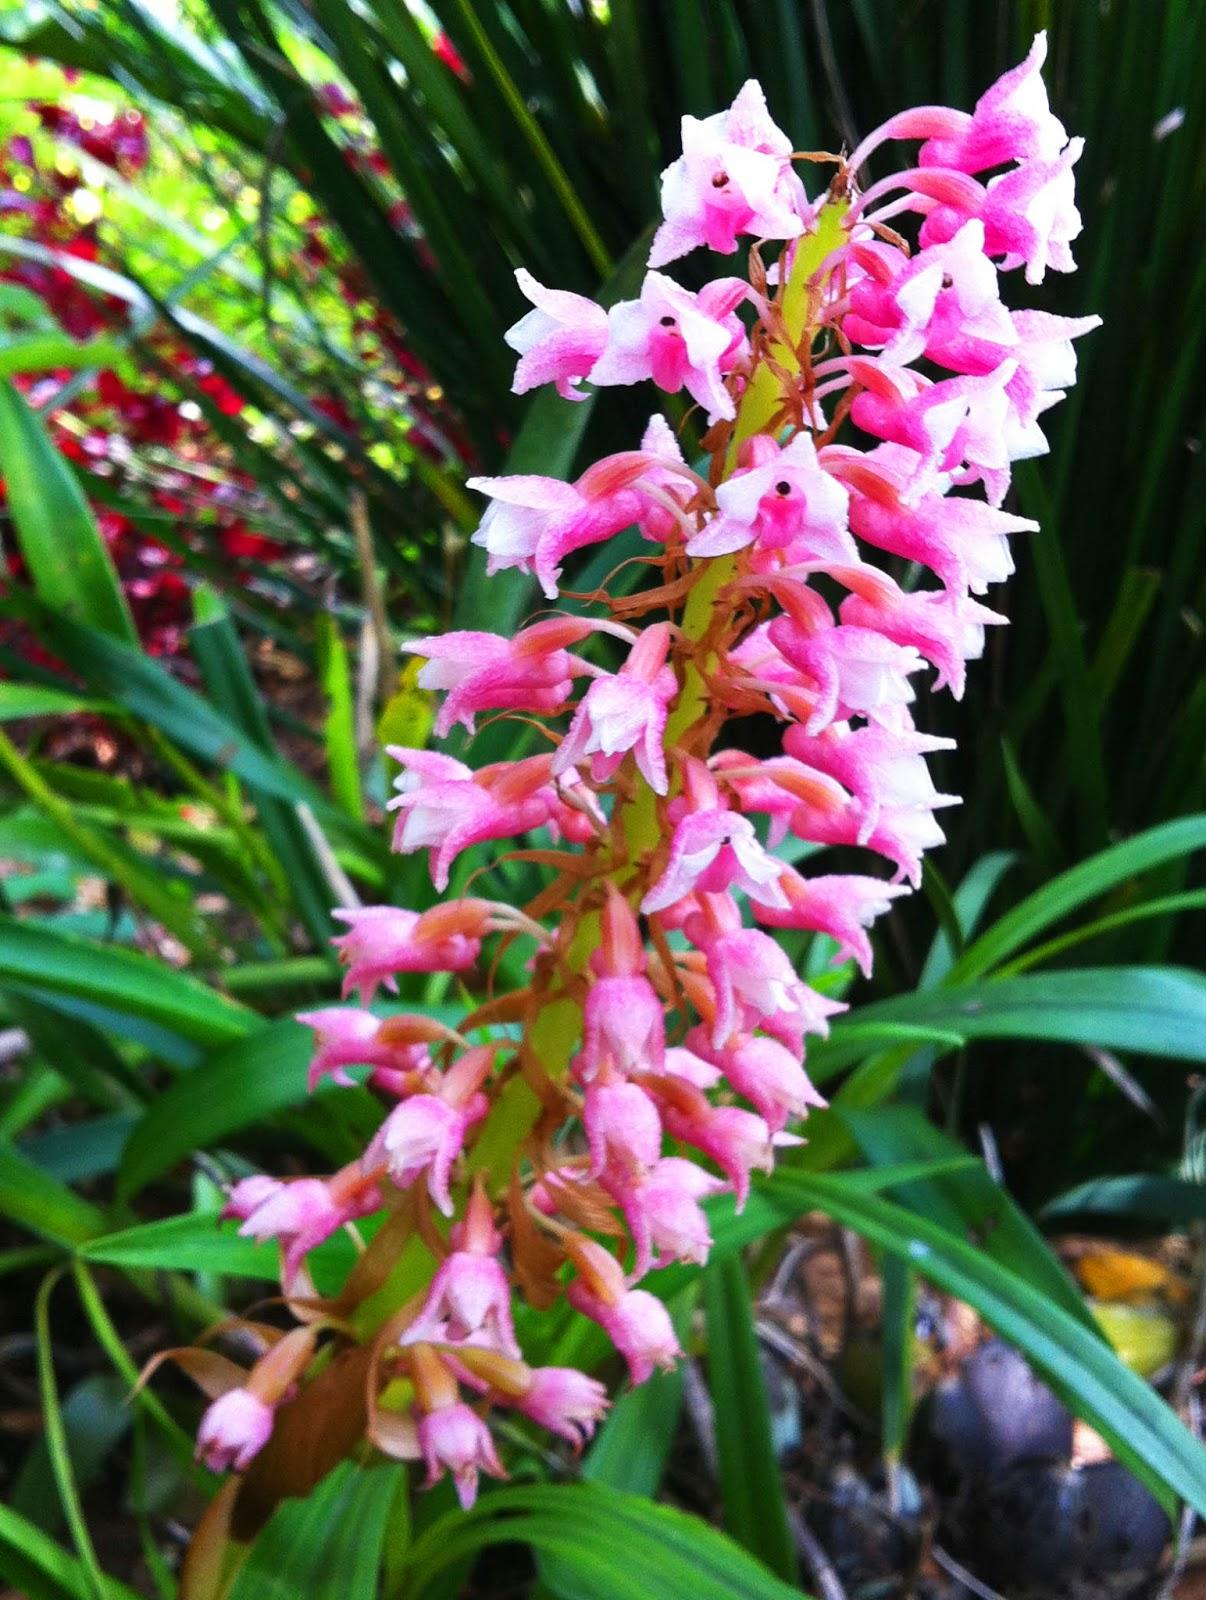 http://lagaleriadelcorazonabierto.blogspot.mx/2013/08/el-paraiso-de-potaltik.html